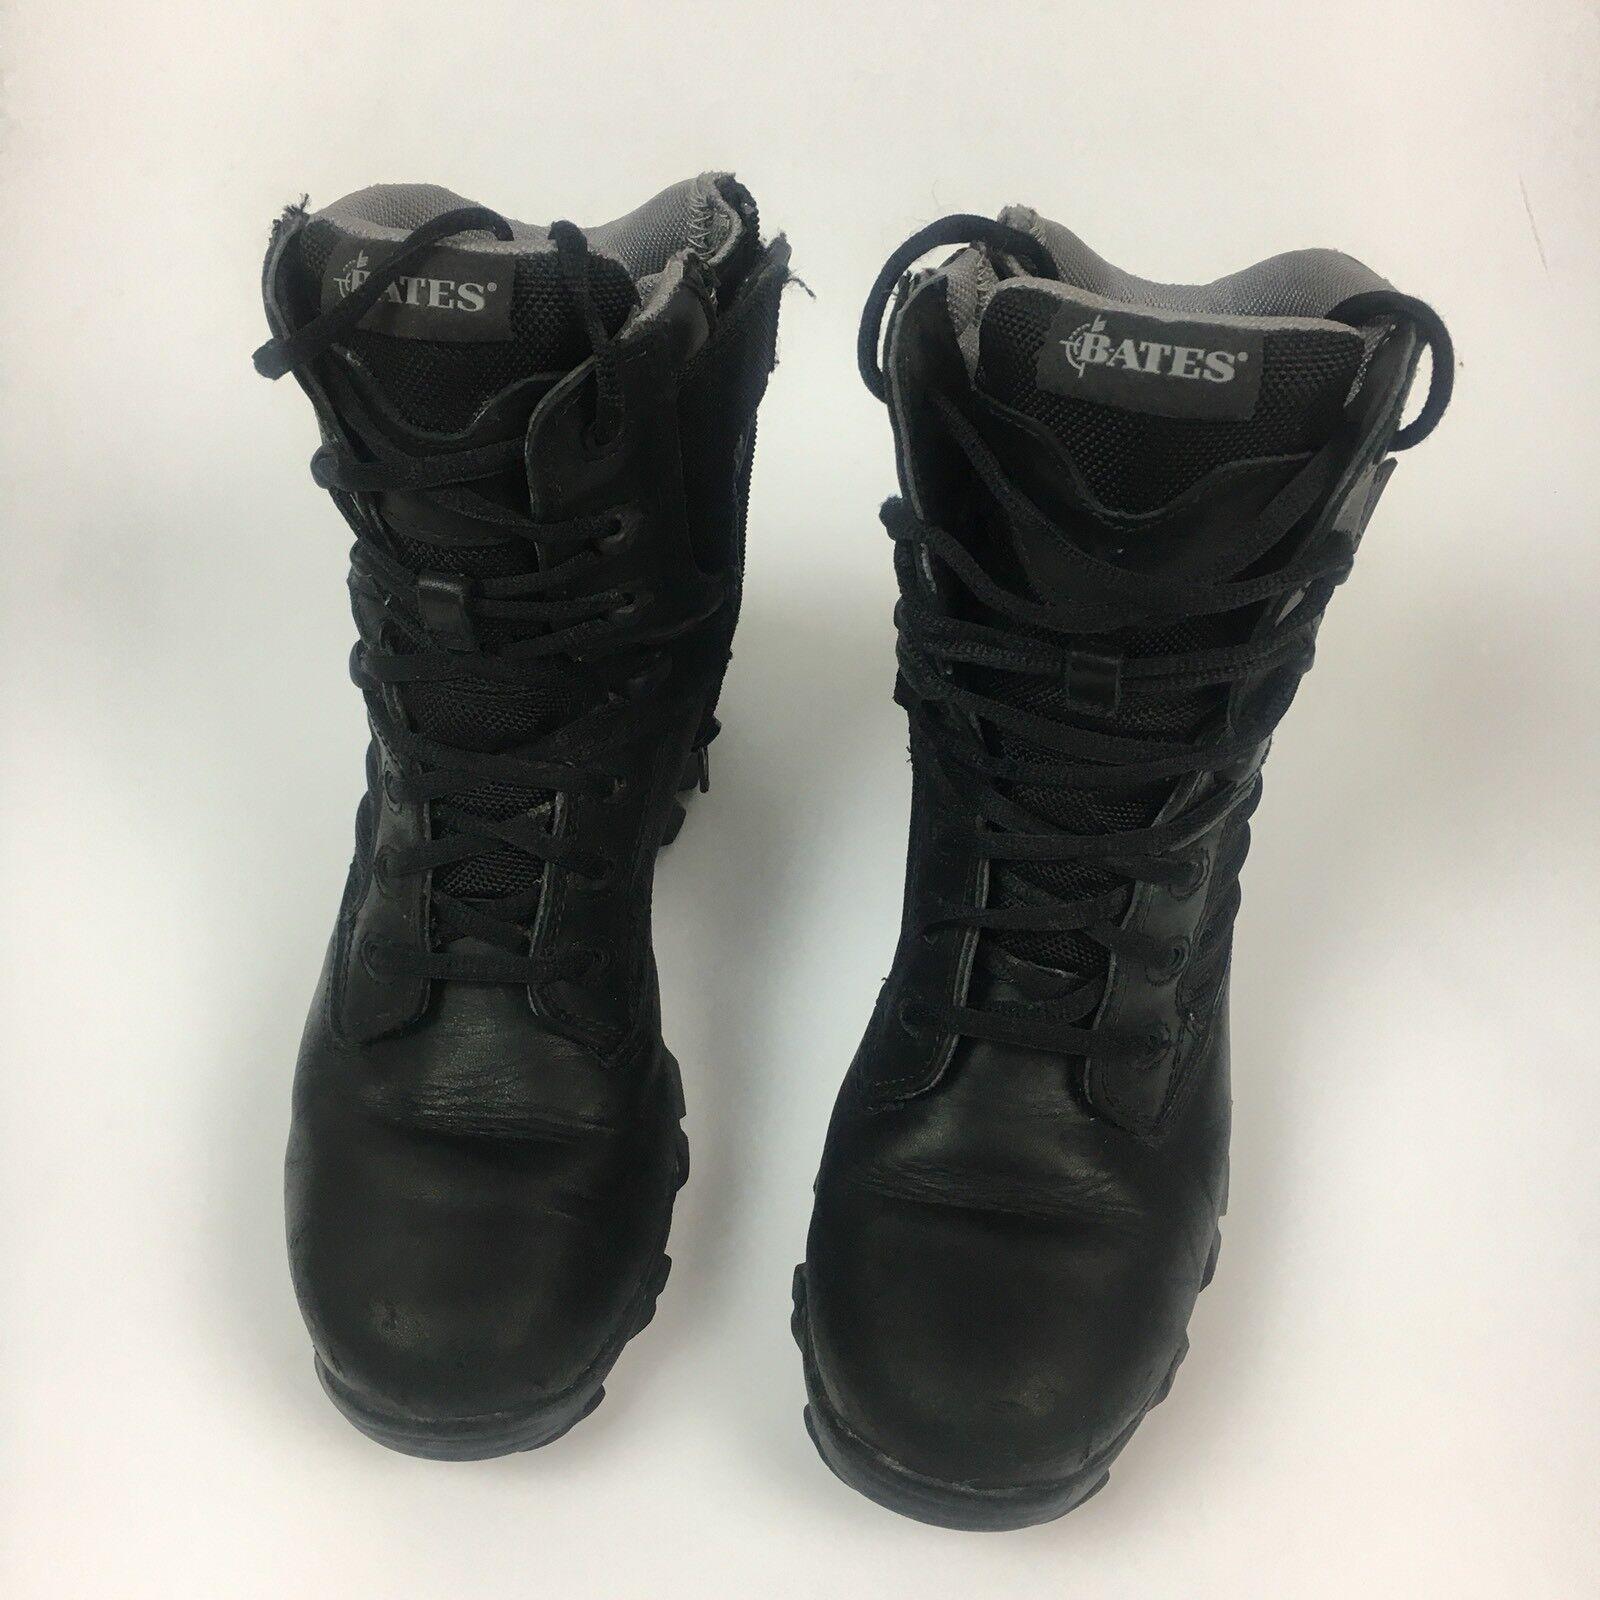 Bates E02788 Enforcer Black Leather Work Tactical Service Boots Size US 7